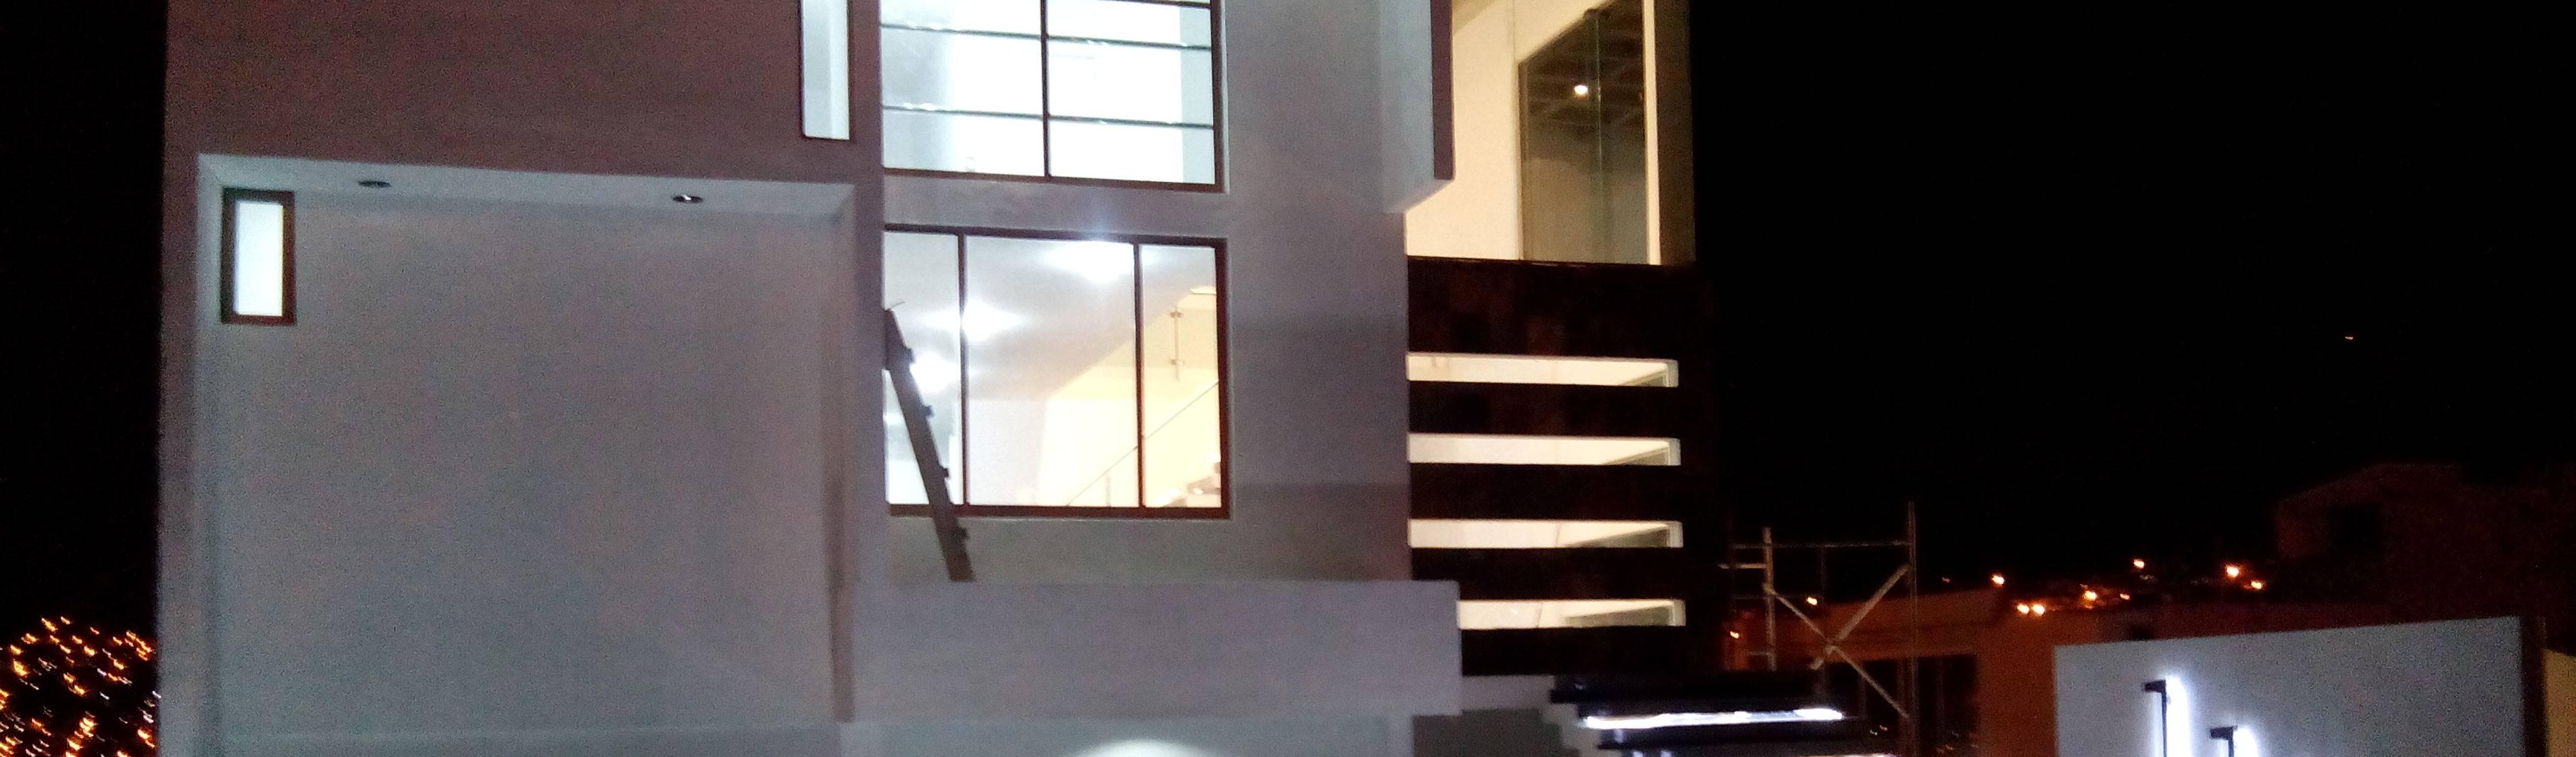 + Ingenio Arquitectura y Diseño